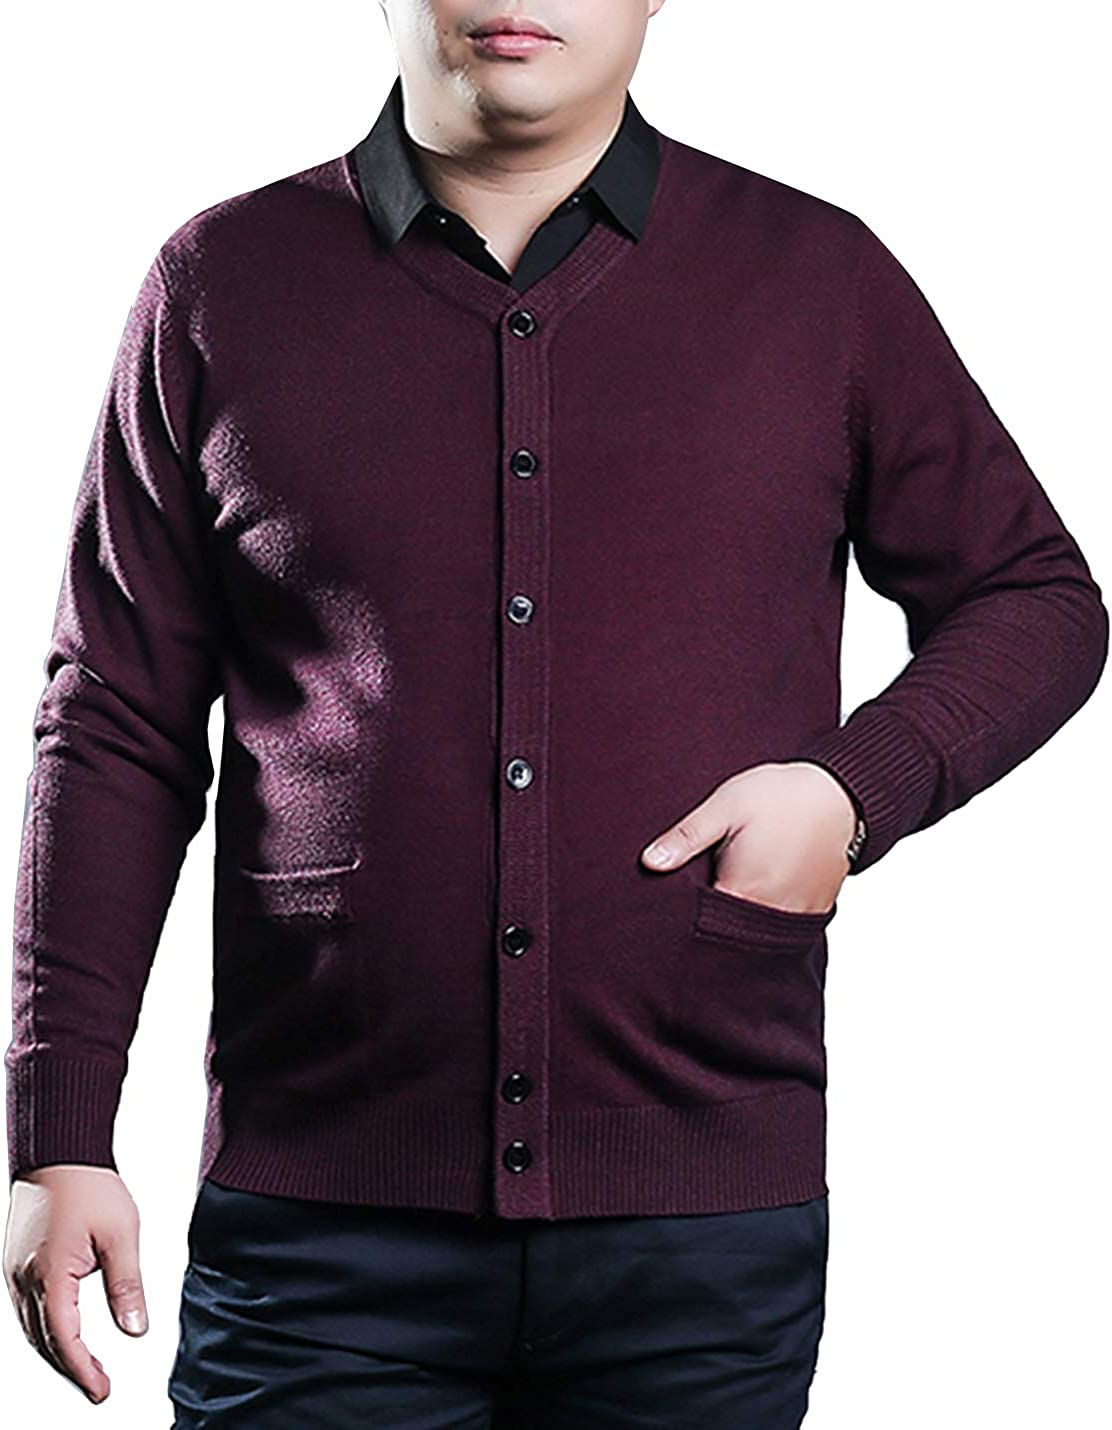 PEHMEA Men's Oversized Button Front Long Sleeve Cardigan Sweater